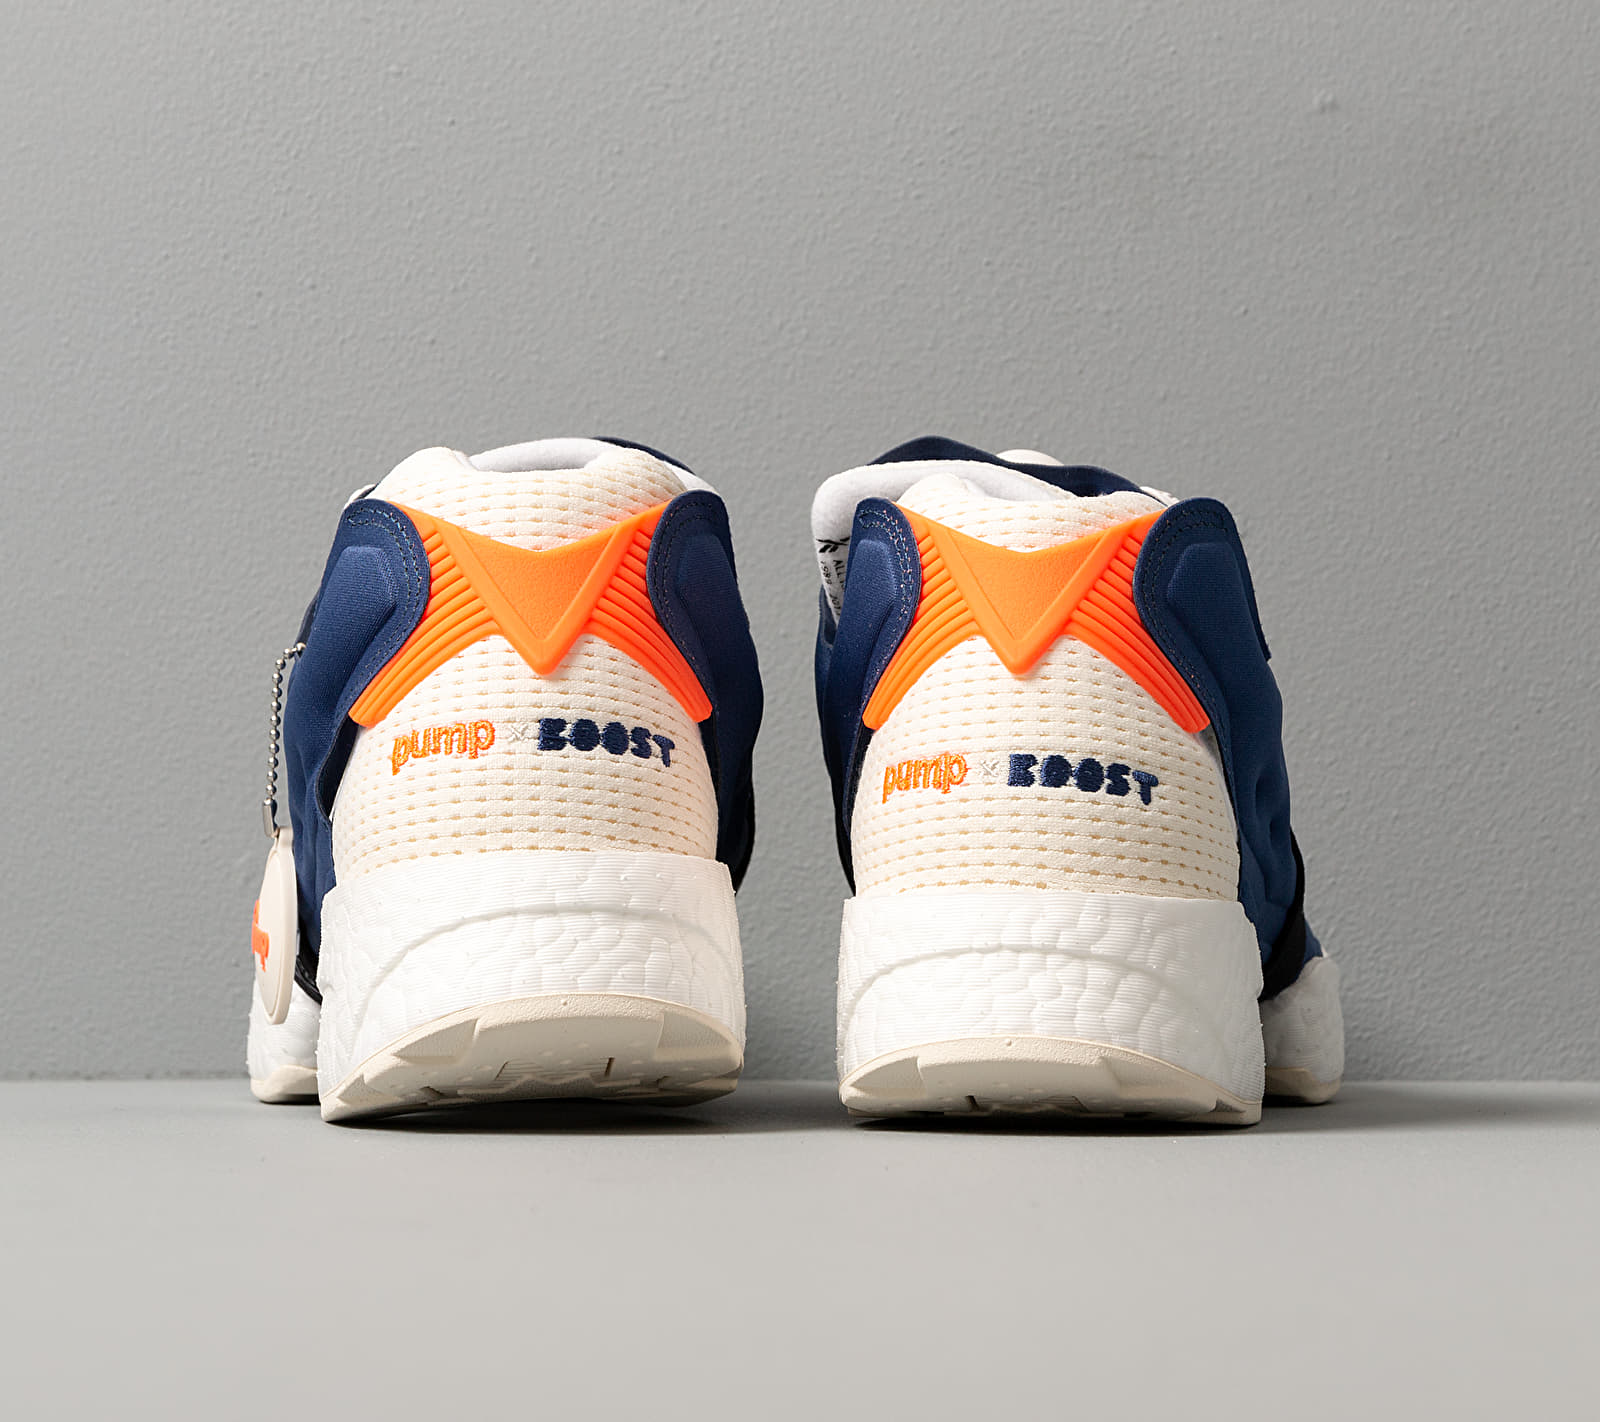 Reebok Instapump Fury BOOST Classic White/ Club Blue/ Solar Orange